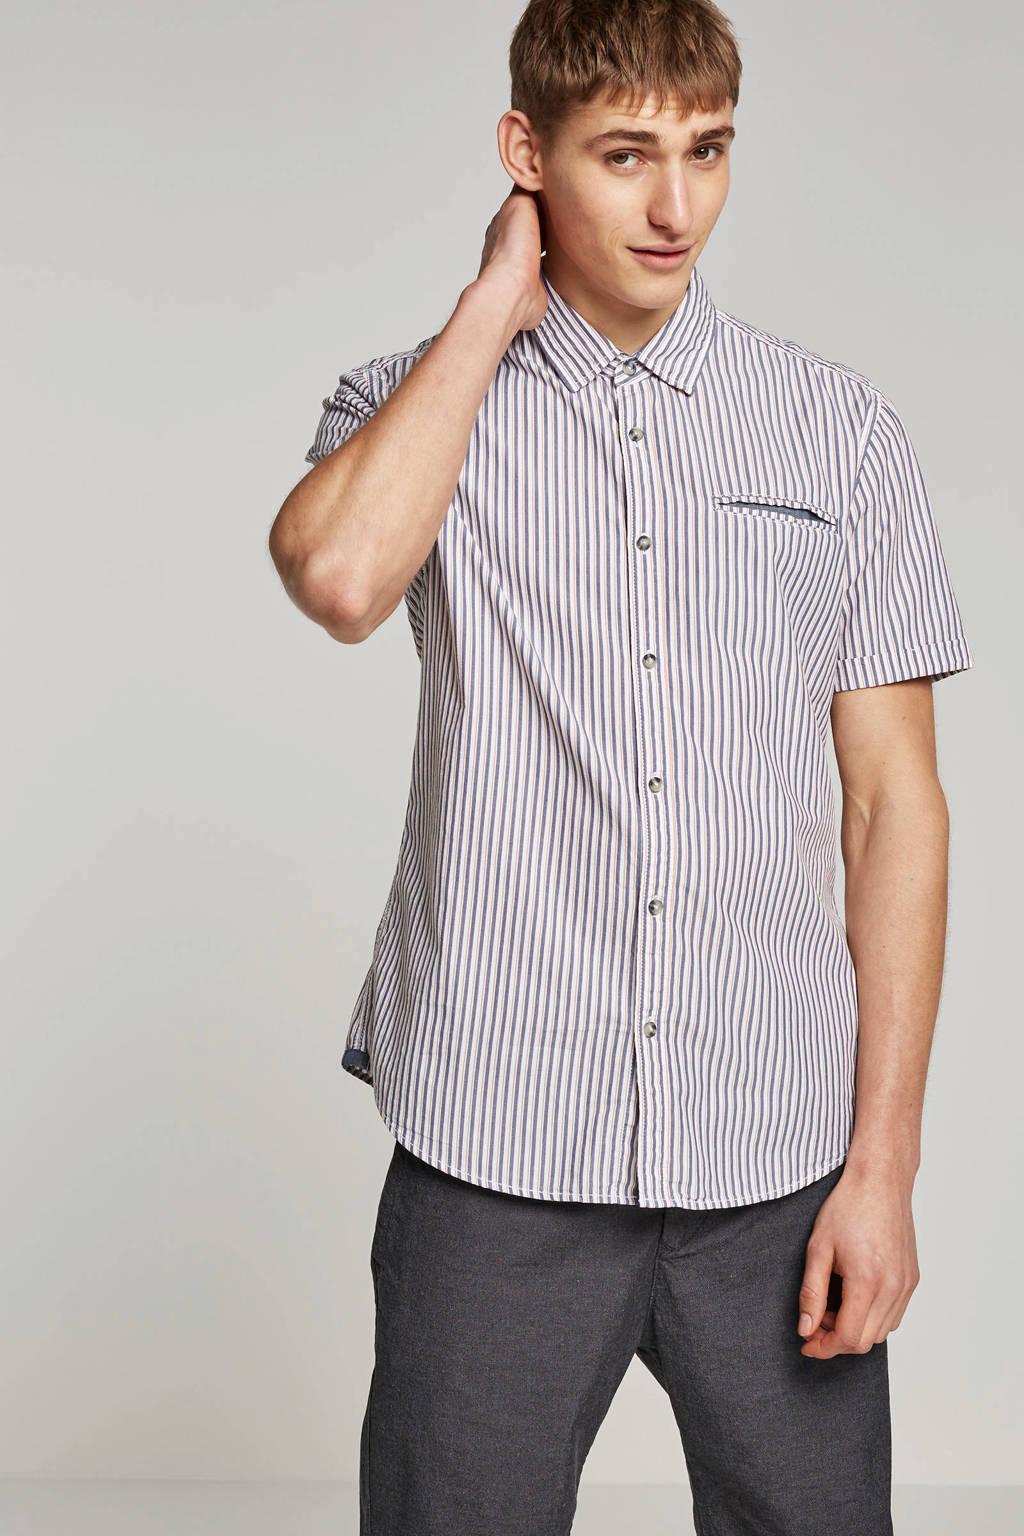 edc Men slim fit overhemd korte mouw, Wit/blauw